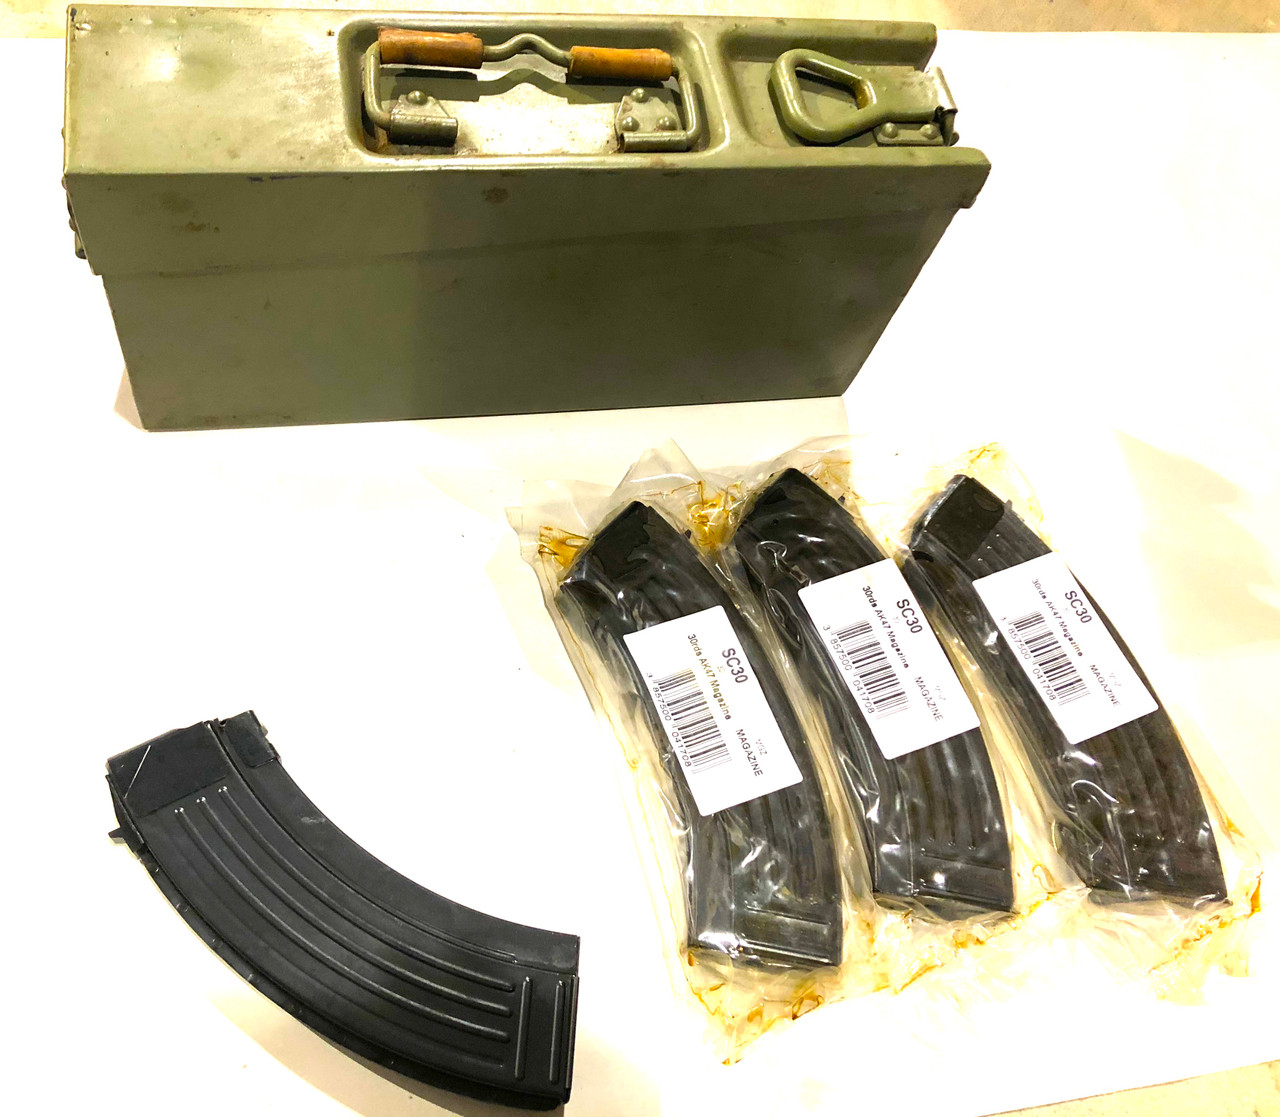 4 x CROATIAN AK-47 7.62x39 Mags with Yugoslav 8mm Ammo Can